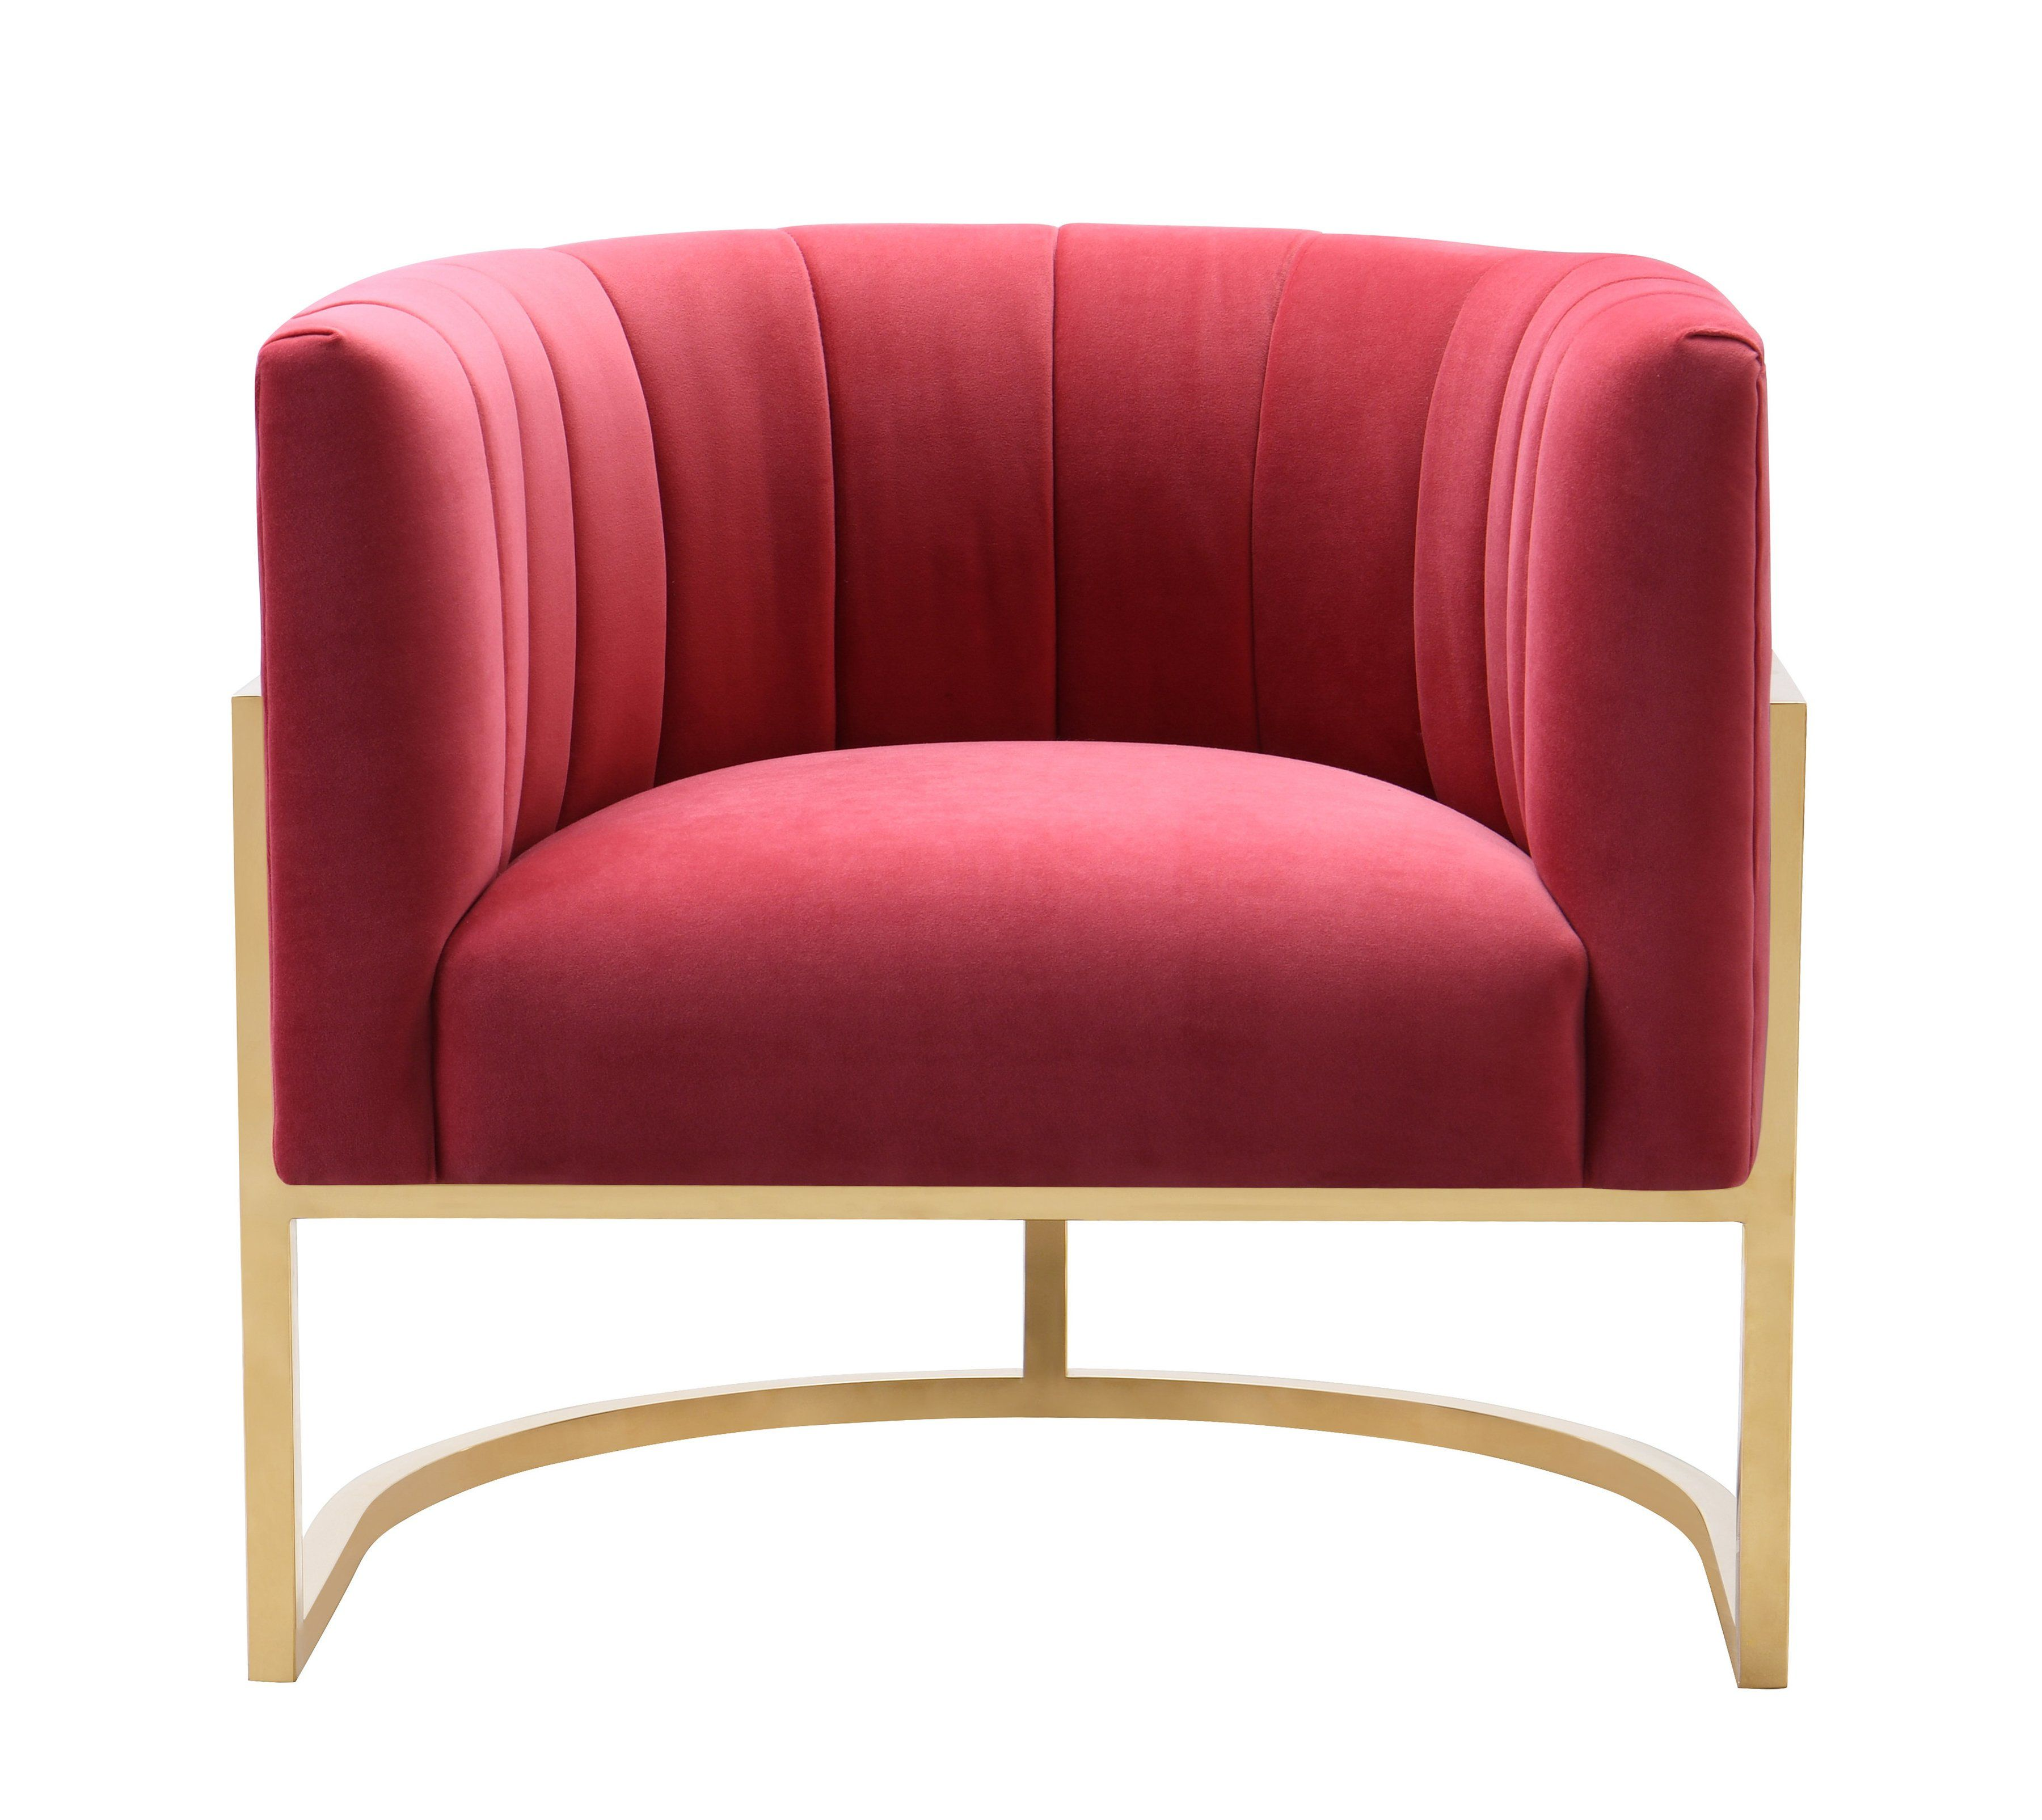 Tov Furniture Modern Magnolia Hot Pink Velvet Chair Tov S6160